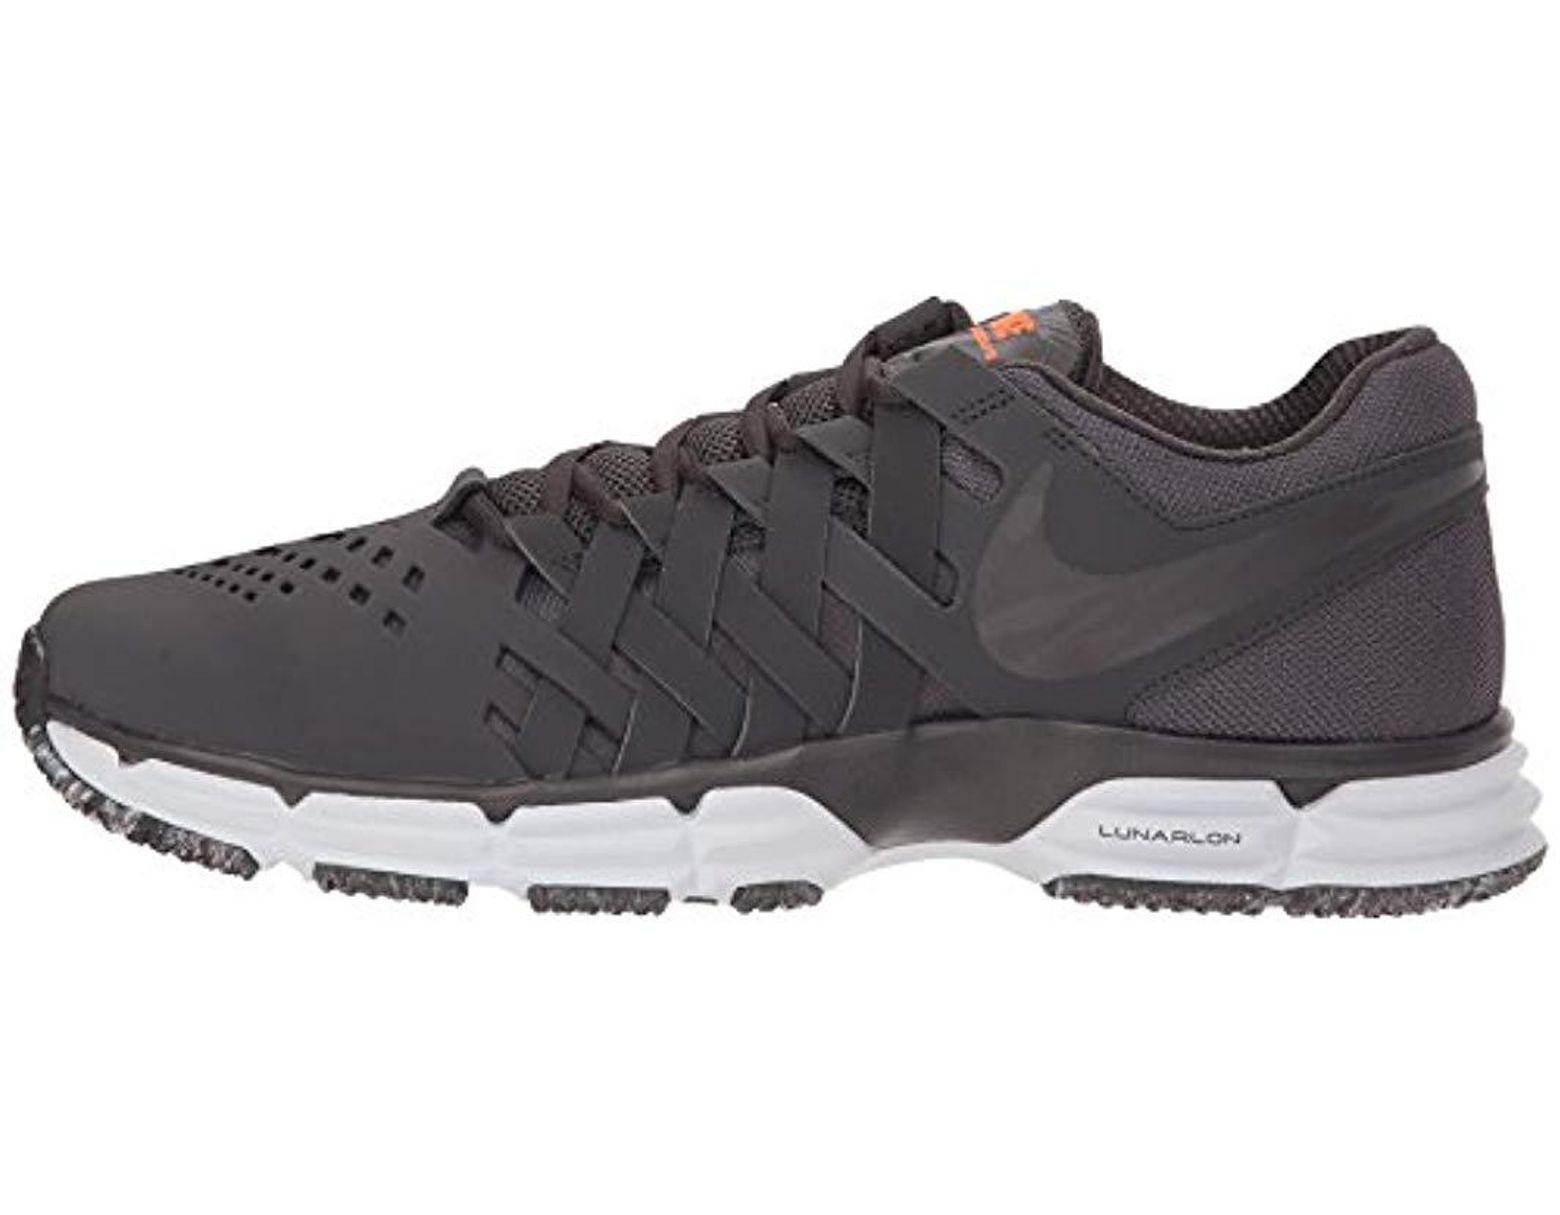 e79ffebdb2af1 Men's Gray Lunar Fingertrap Sneaker